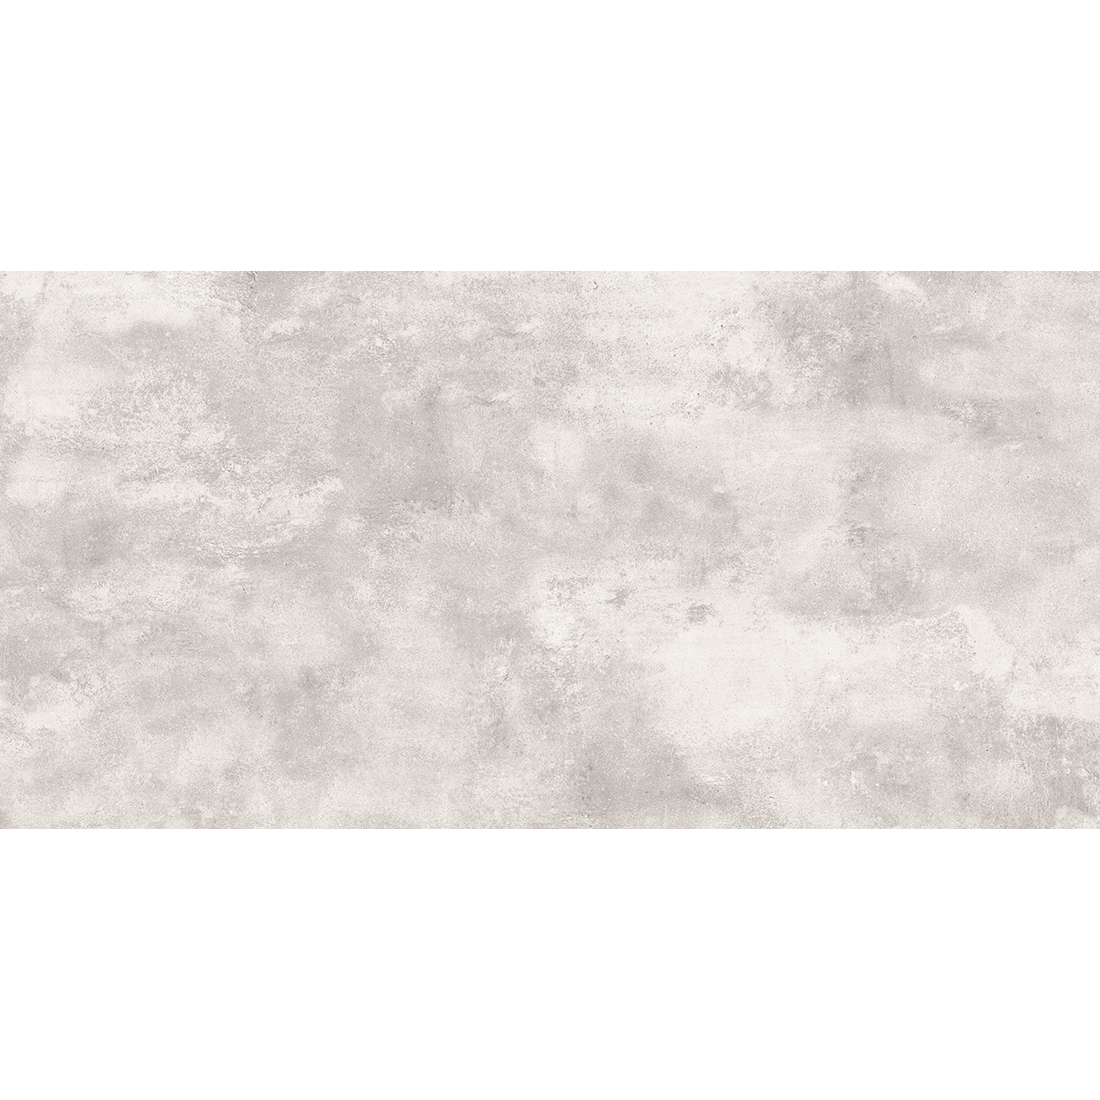 London 30x60 Grey Gloss 1